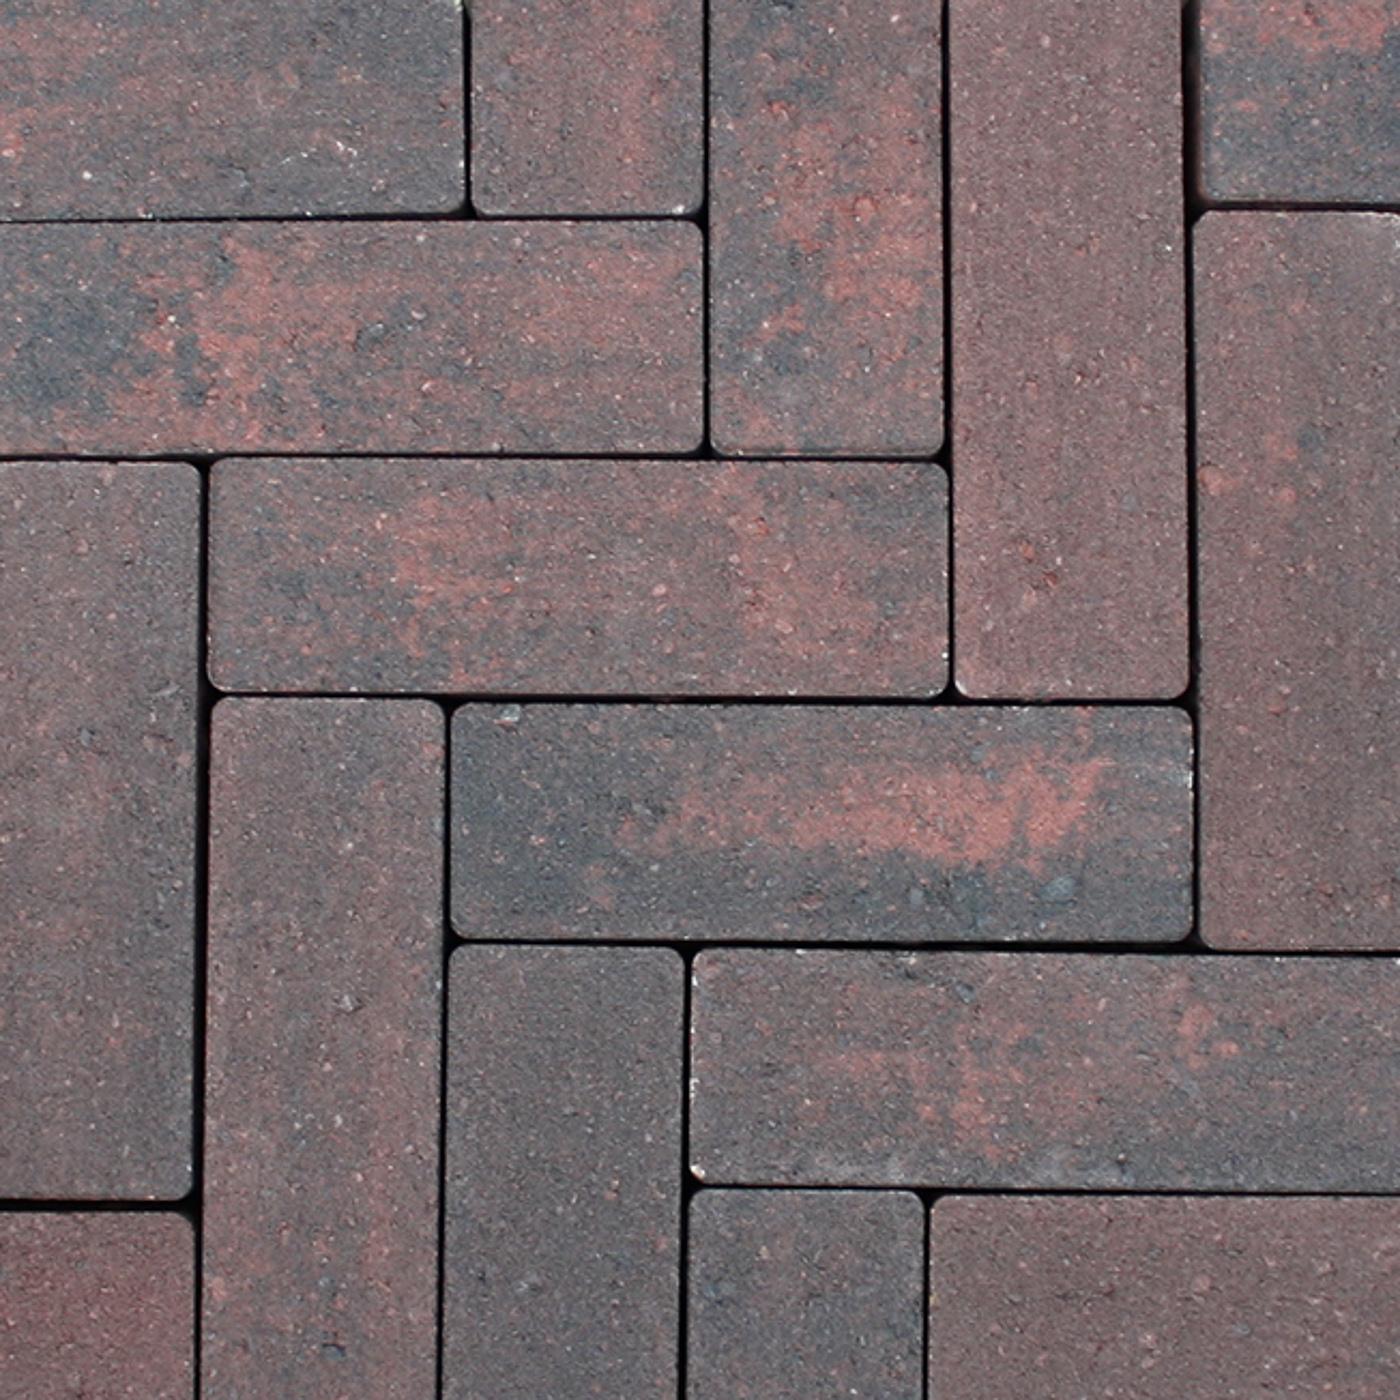 209069 Strackstone+ 21x7x8 Wijnrood-Antraciet (2)